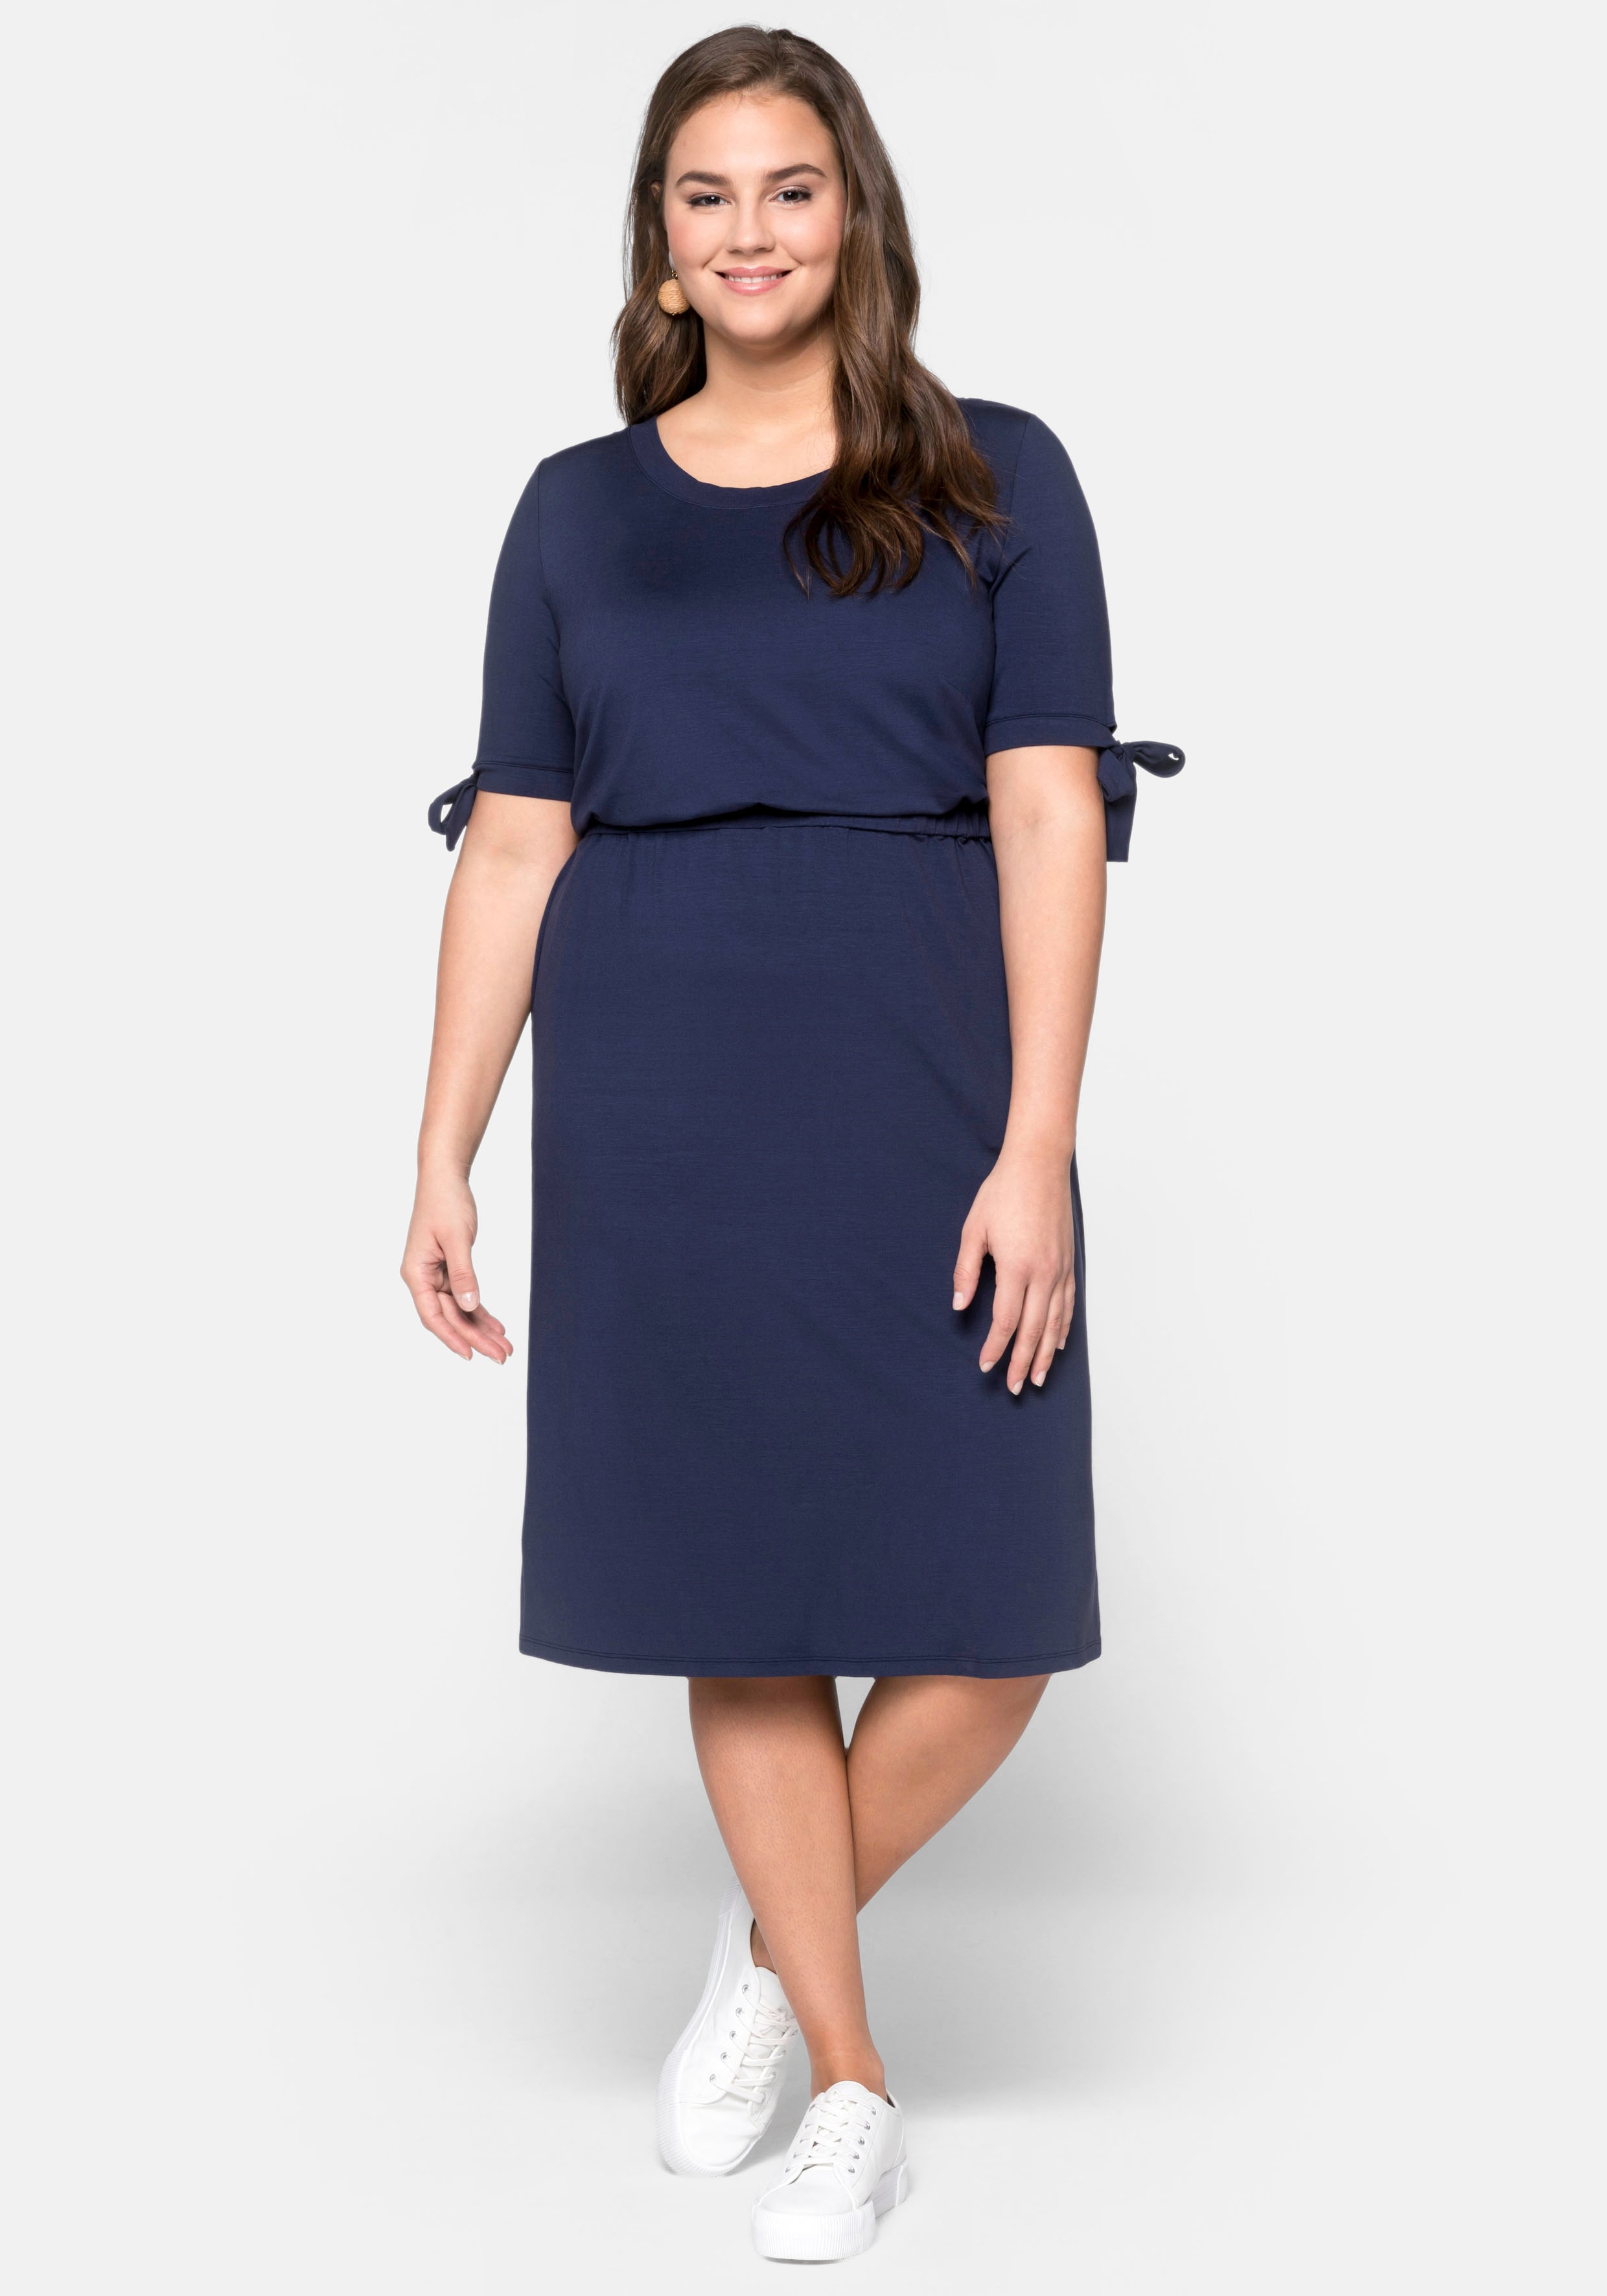 Sheego Shirtkleid Damenmode/Bekleidung/Kleider/Shirtkleider